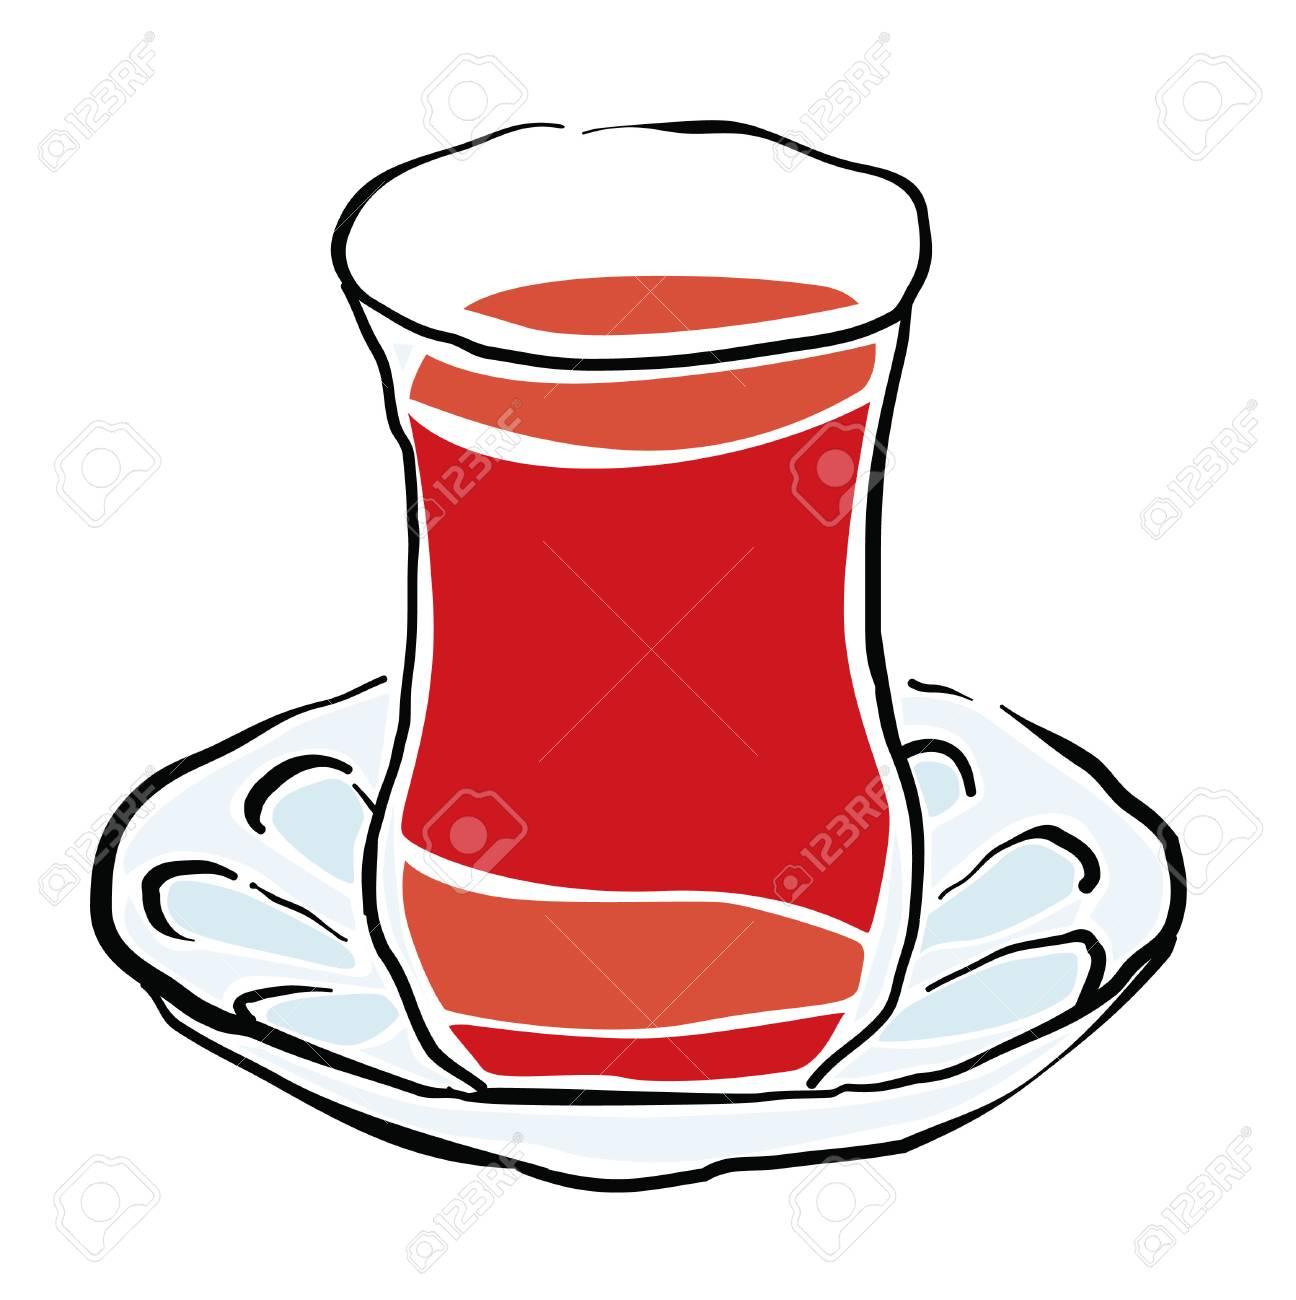 turkish tea vector drawing royalty free cliparts vectors and stock illustration image 91210625 turkish tea vector drawing